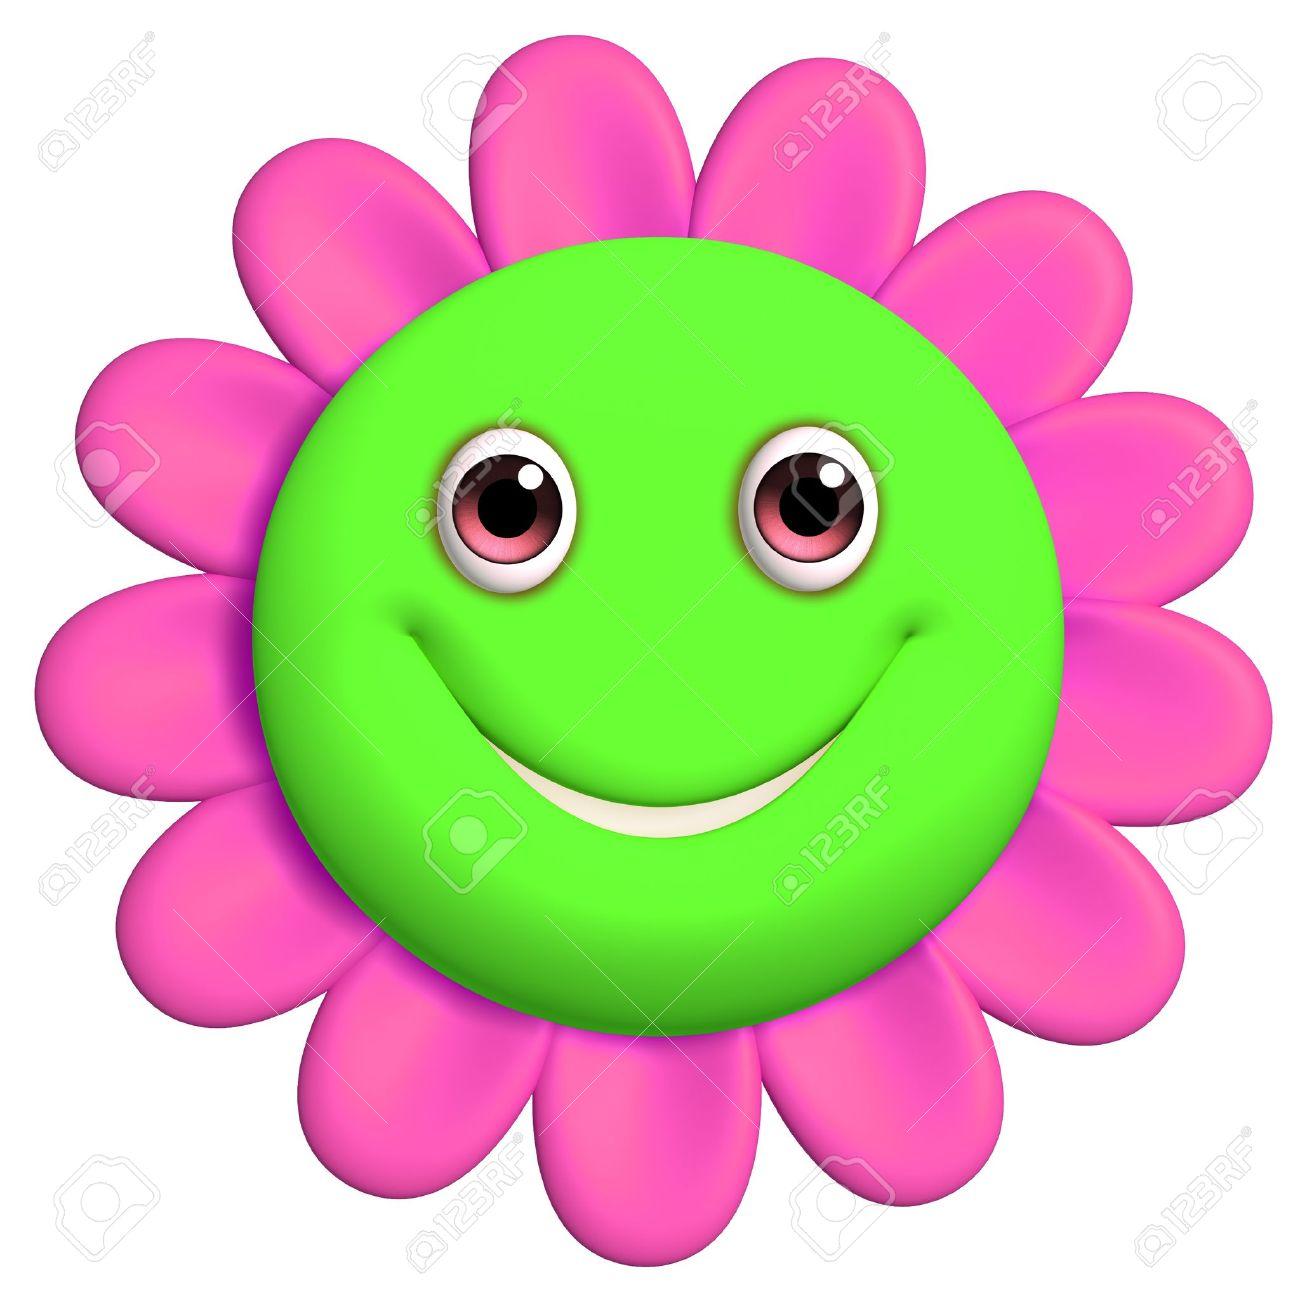 Smiley clipart flower Stock Best Green #23609 com